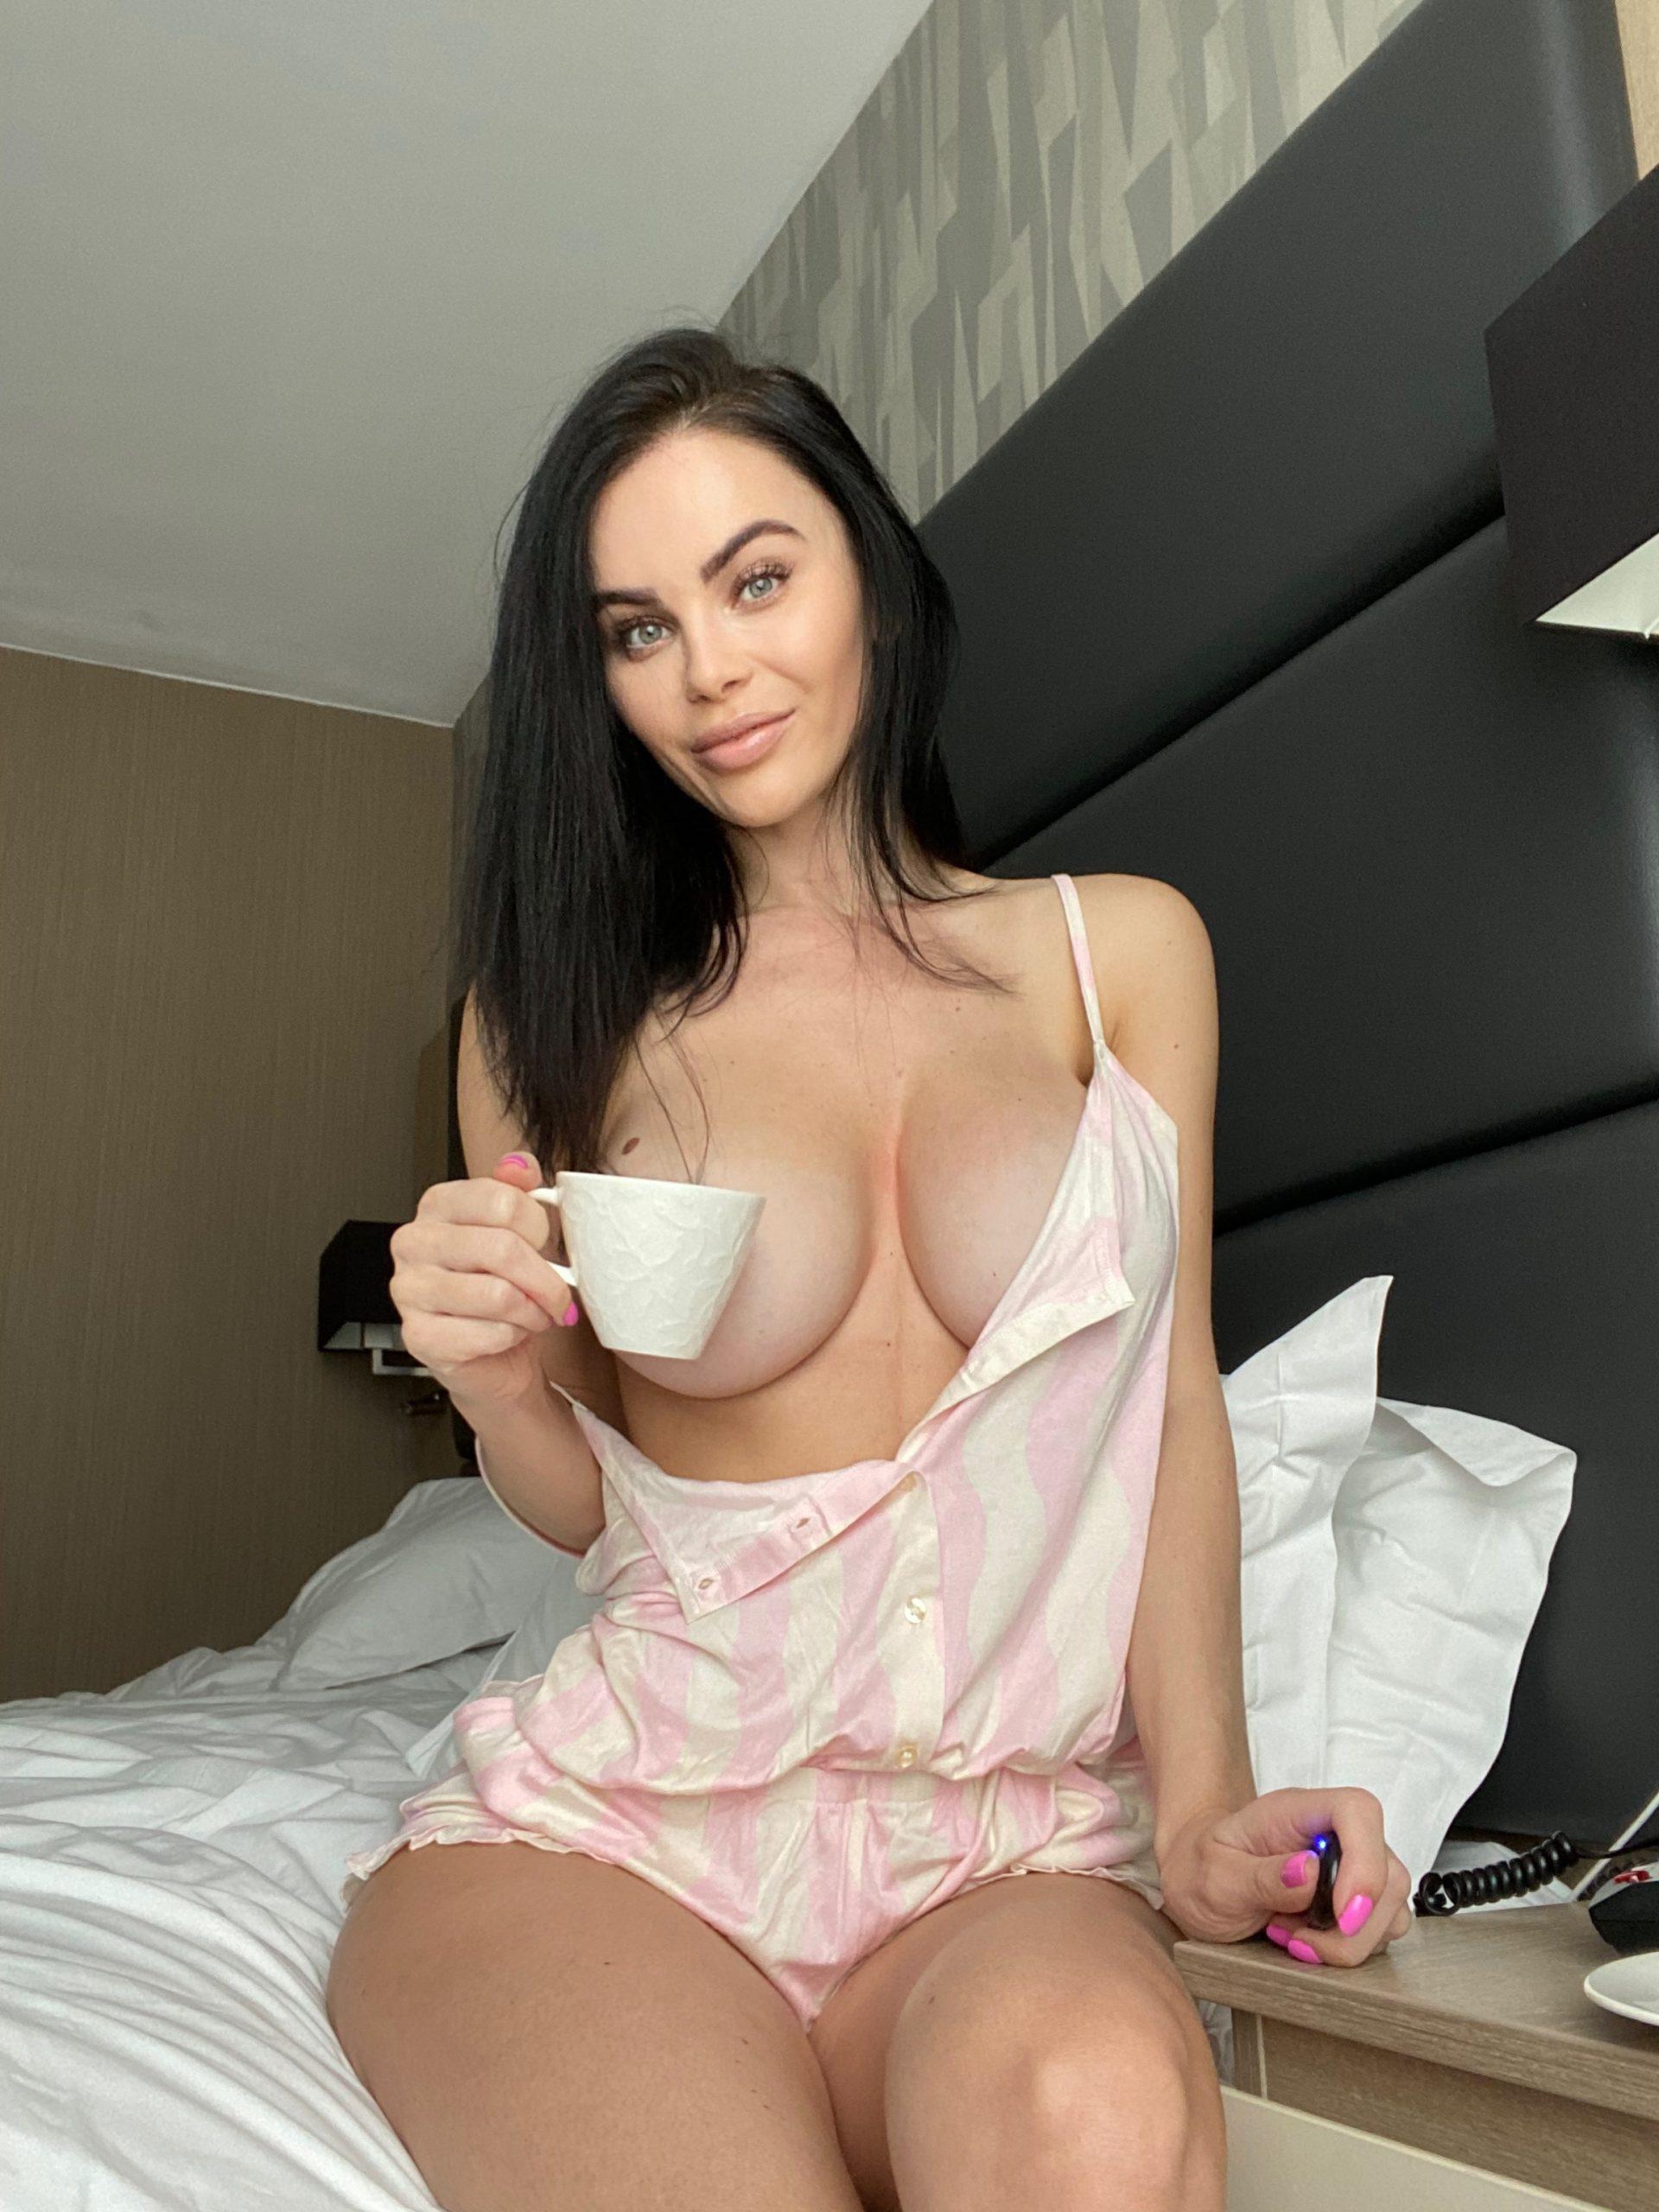 Morning coffee ☕️